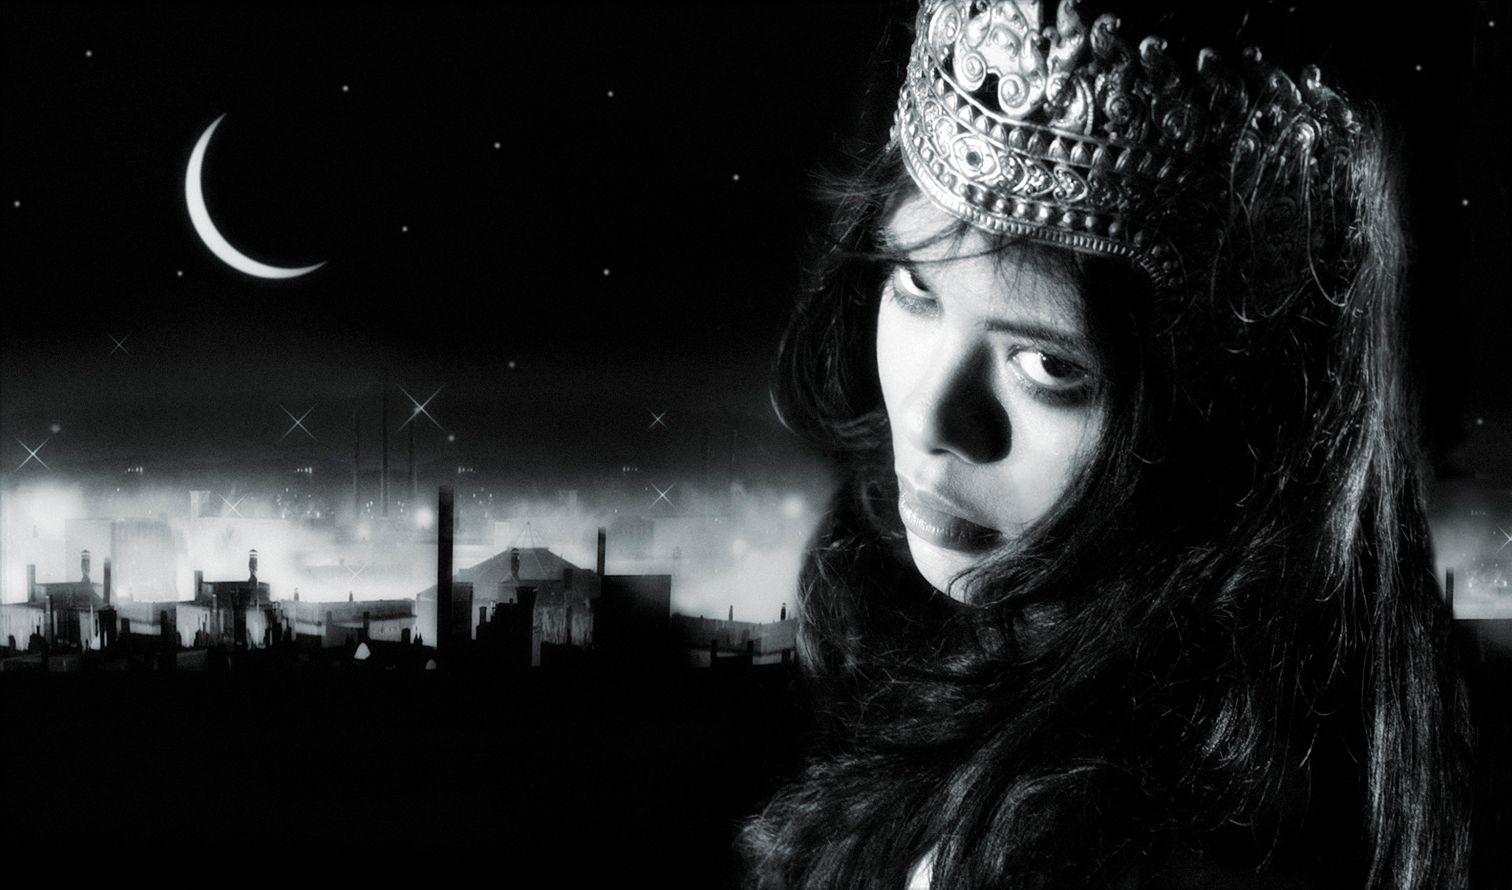 Netherworld, A Fairy's Tale film